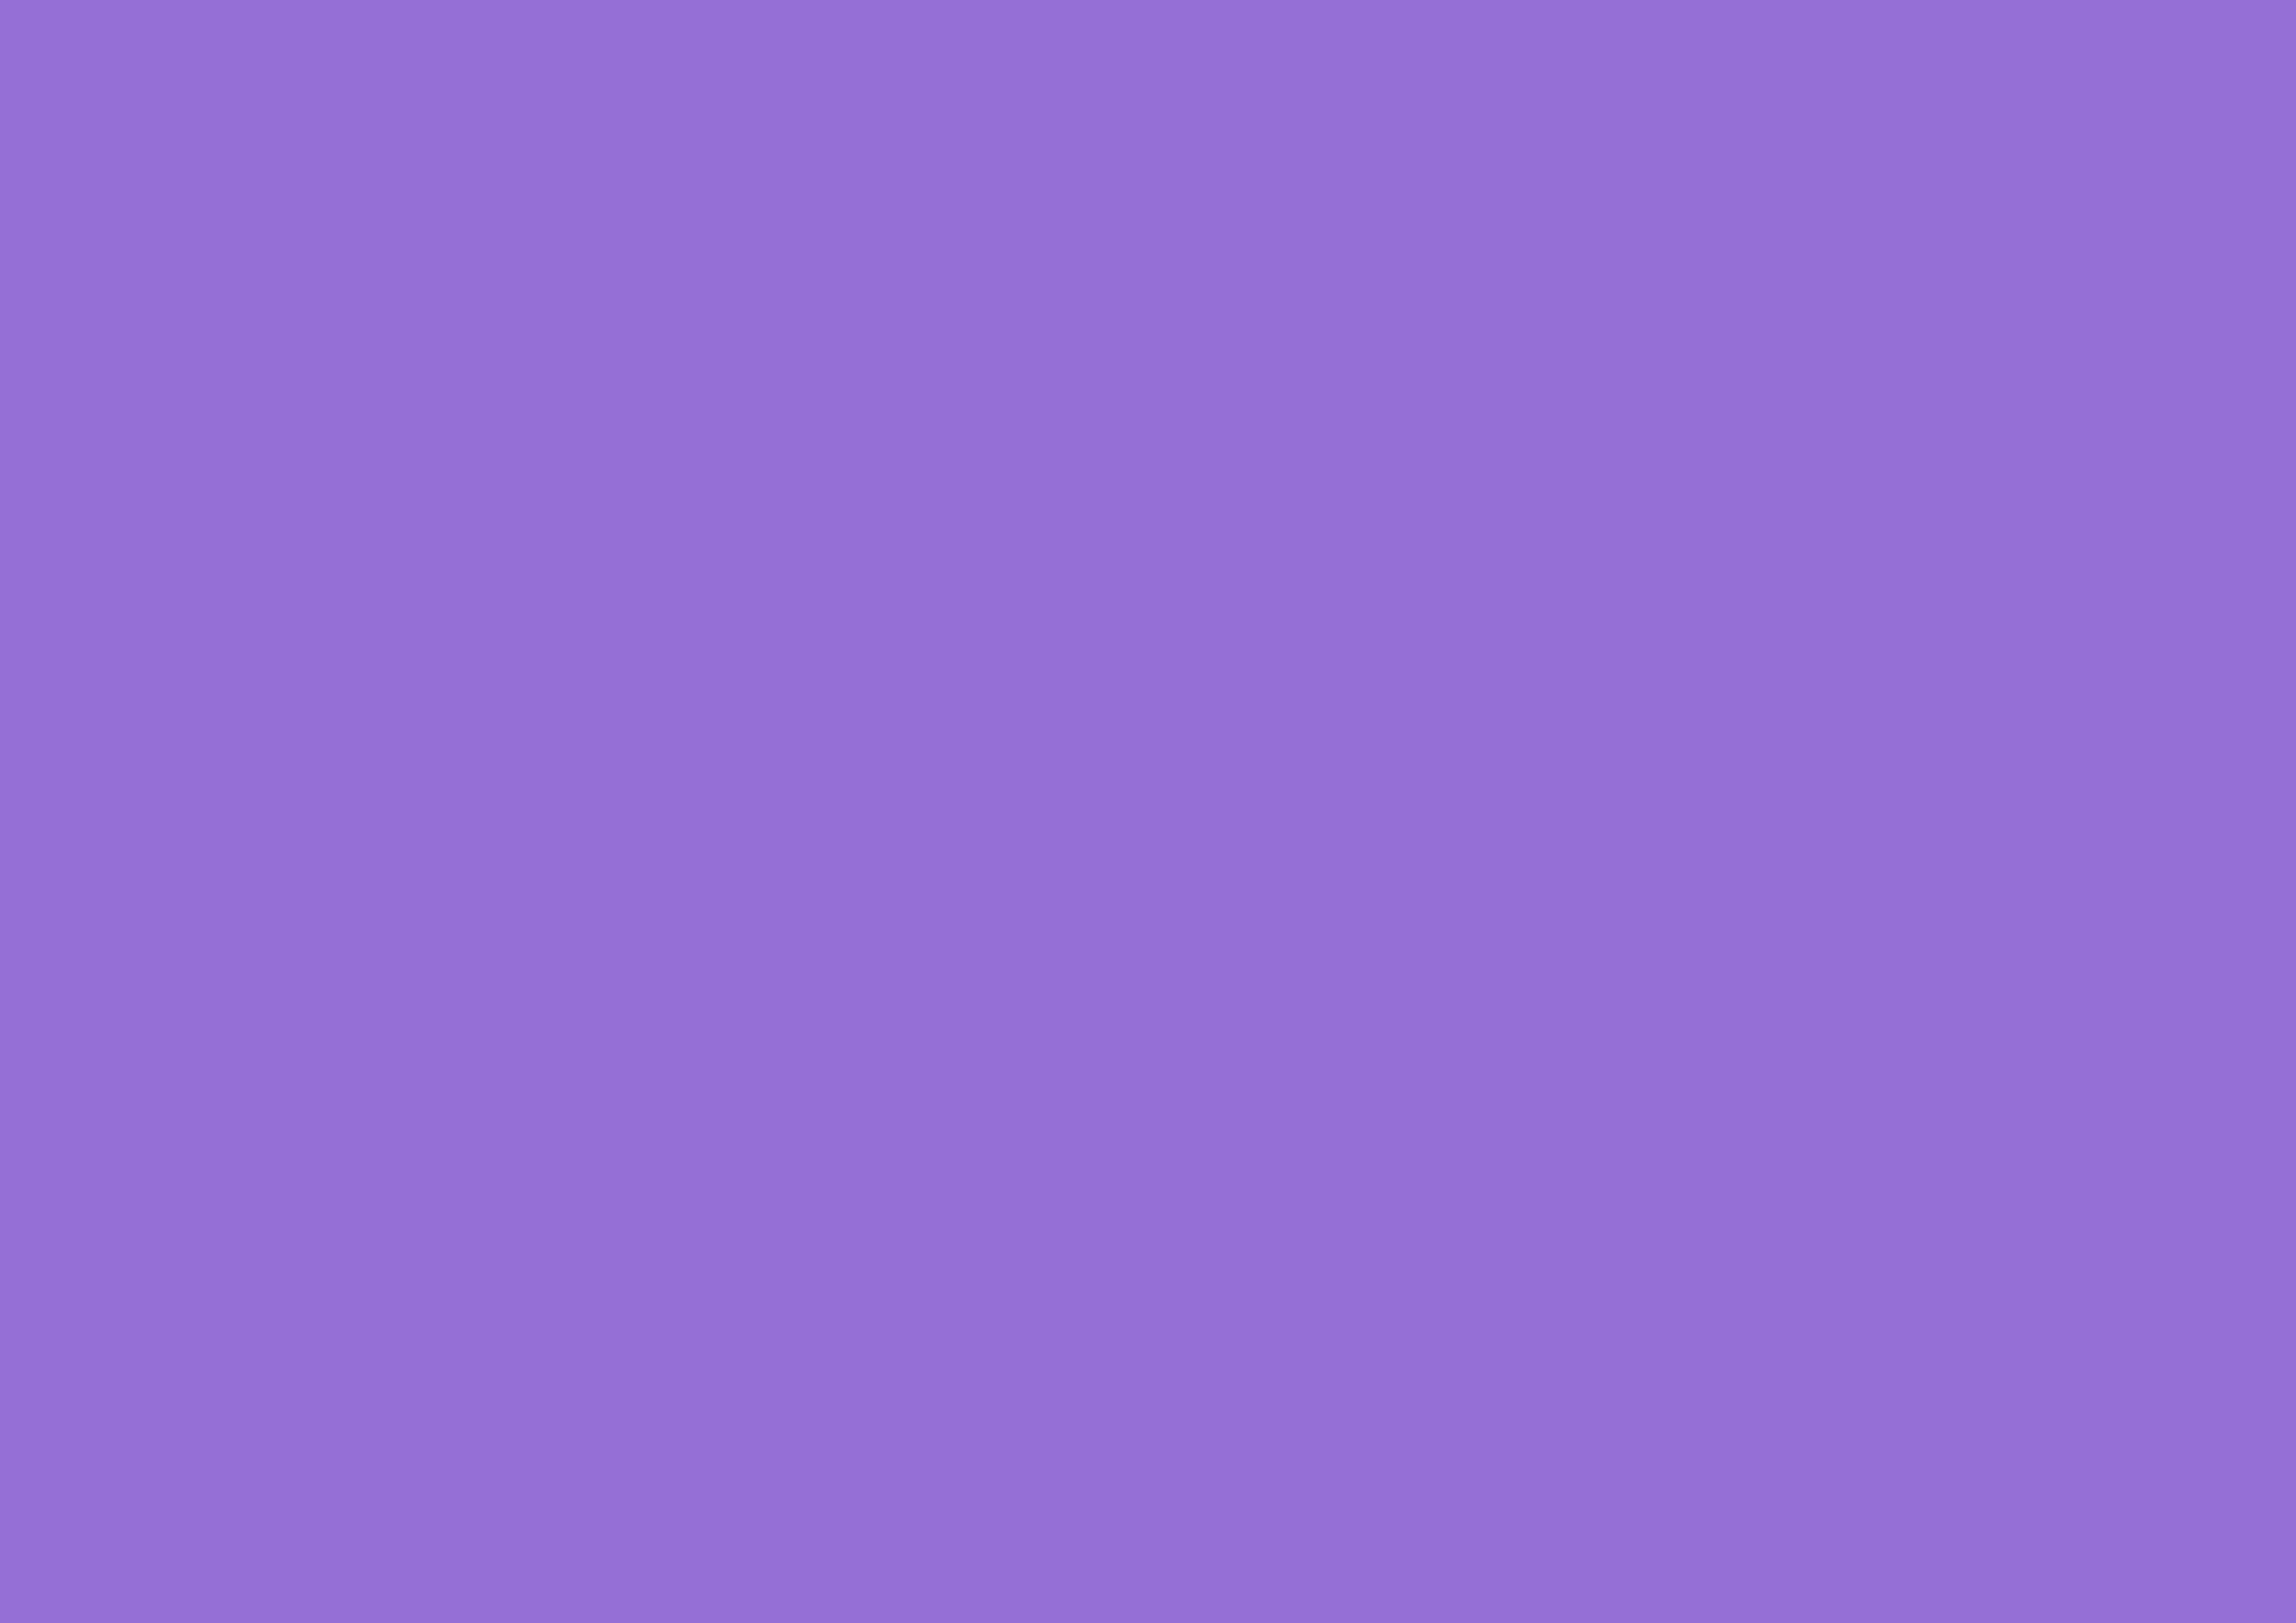 3508x2480 Dark Pastel Purple Solid Color Background